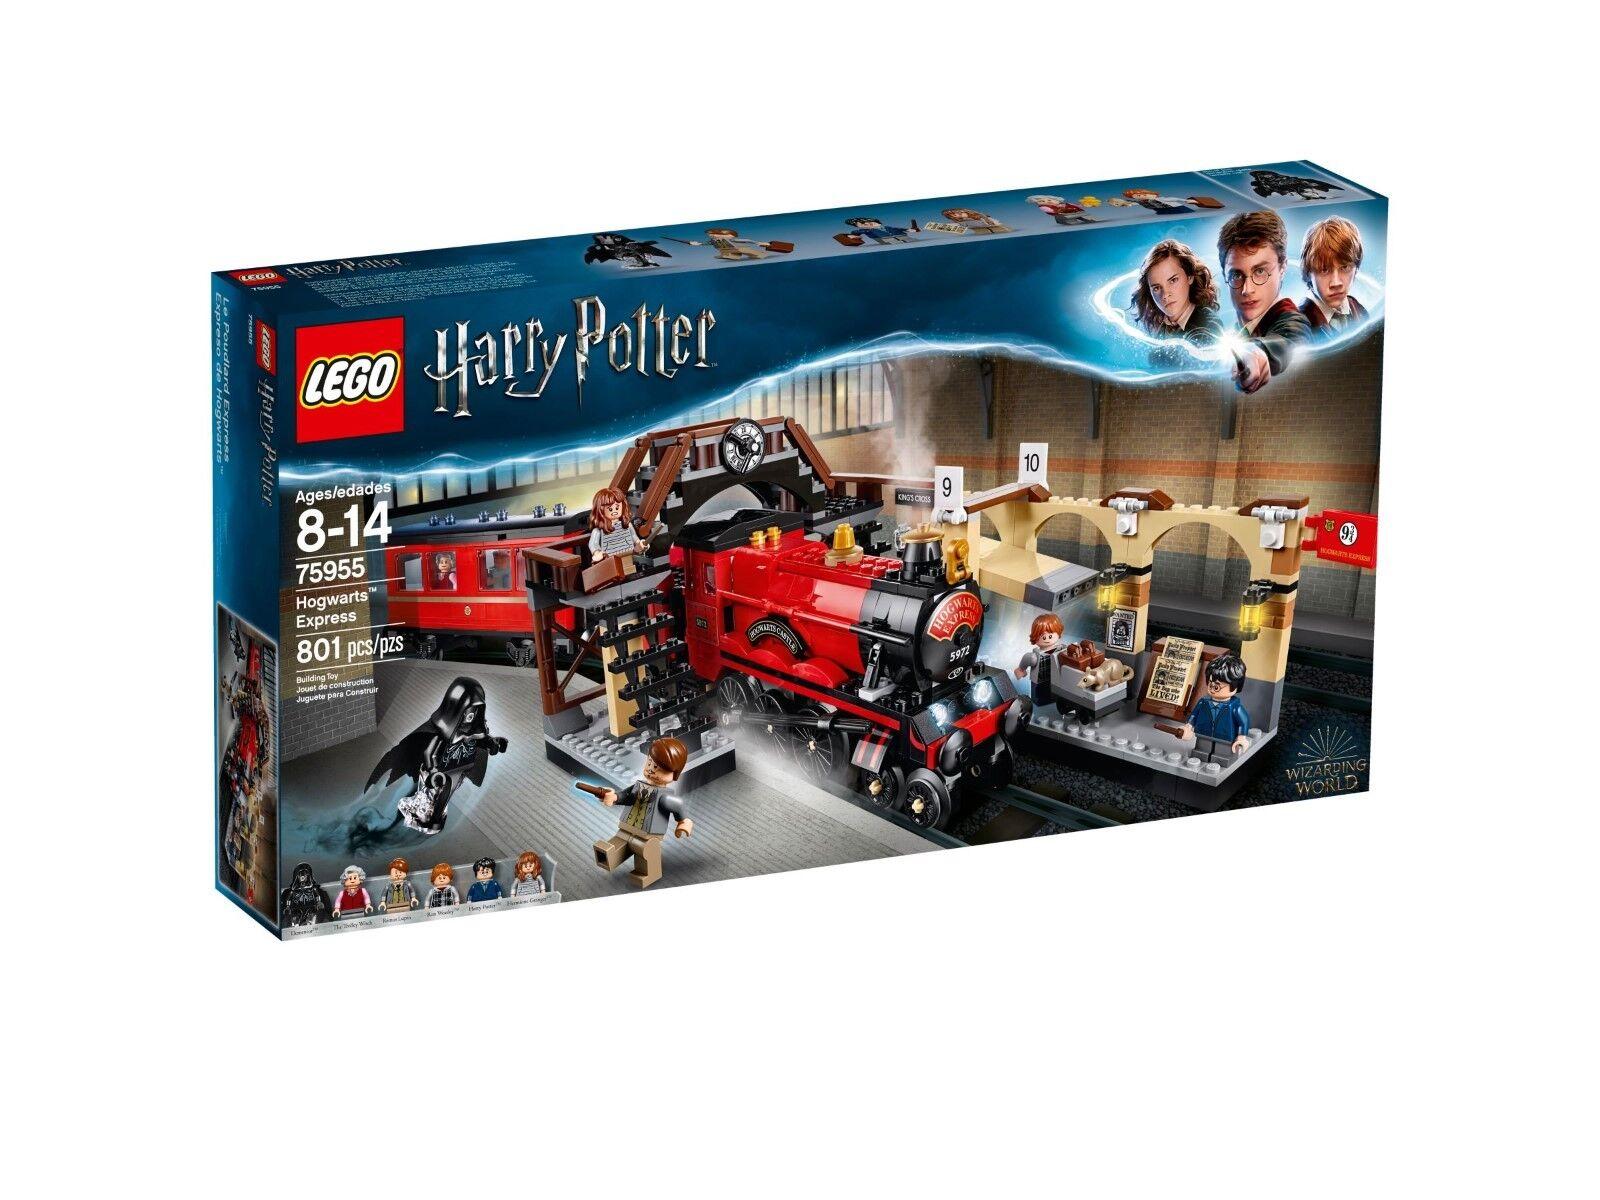 Lego ® Harry Potter ™ 75955 Poudlard ™ express-NEUF & neuf dans sa boîte -